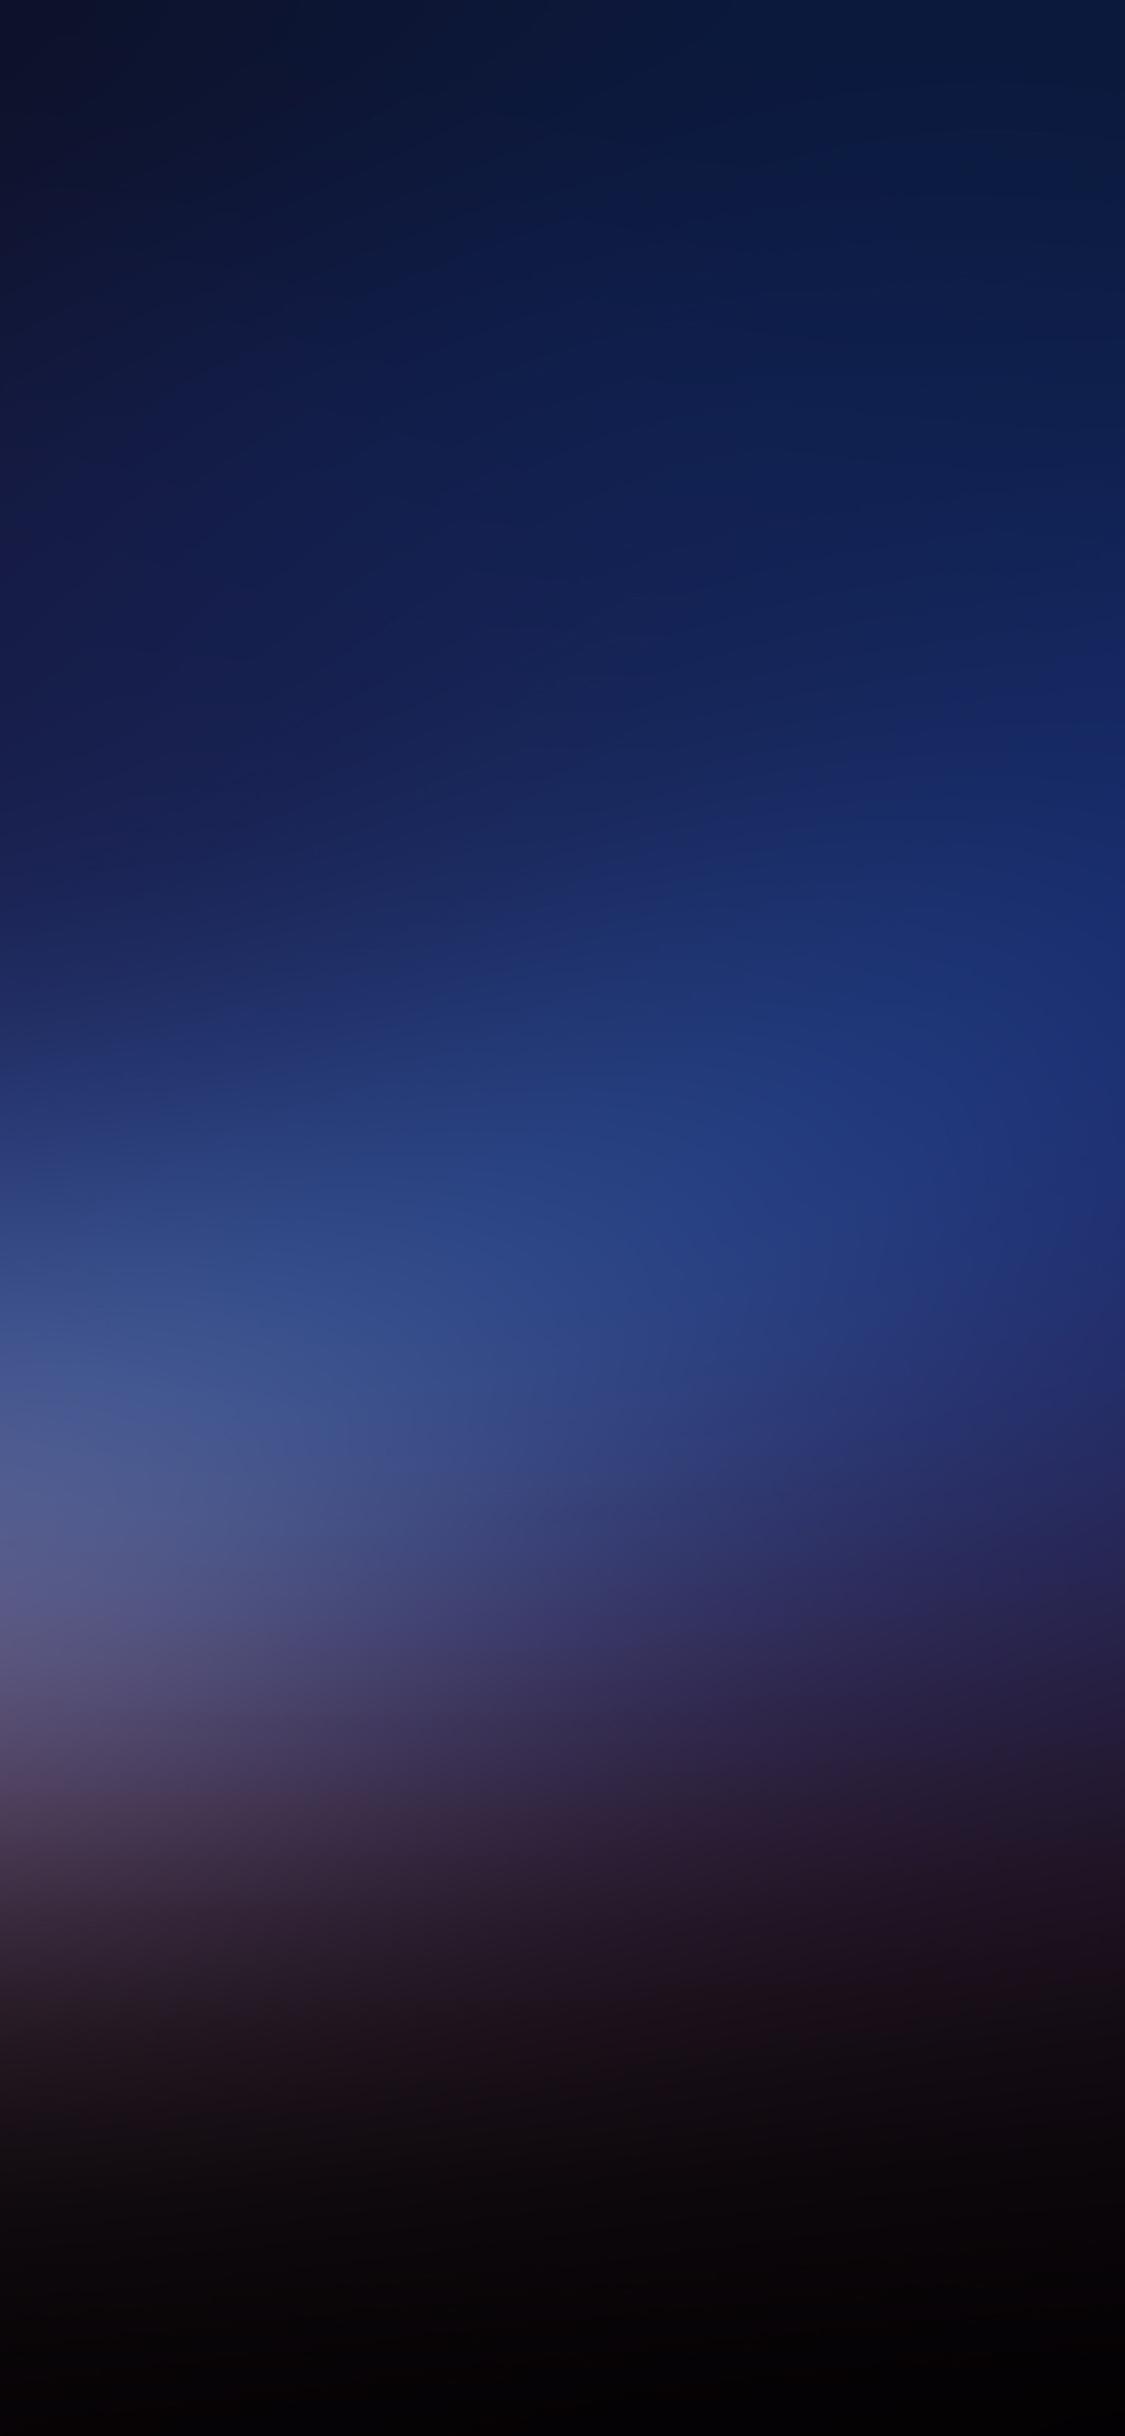 iPhoneXpapers.com-Apple-iPhone-wallpaper-sa79-wallpaper-space-blue-blur